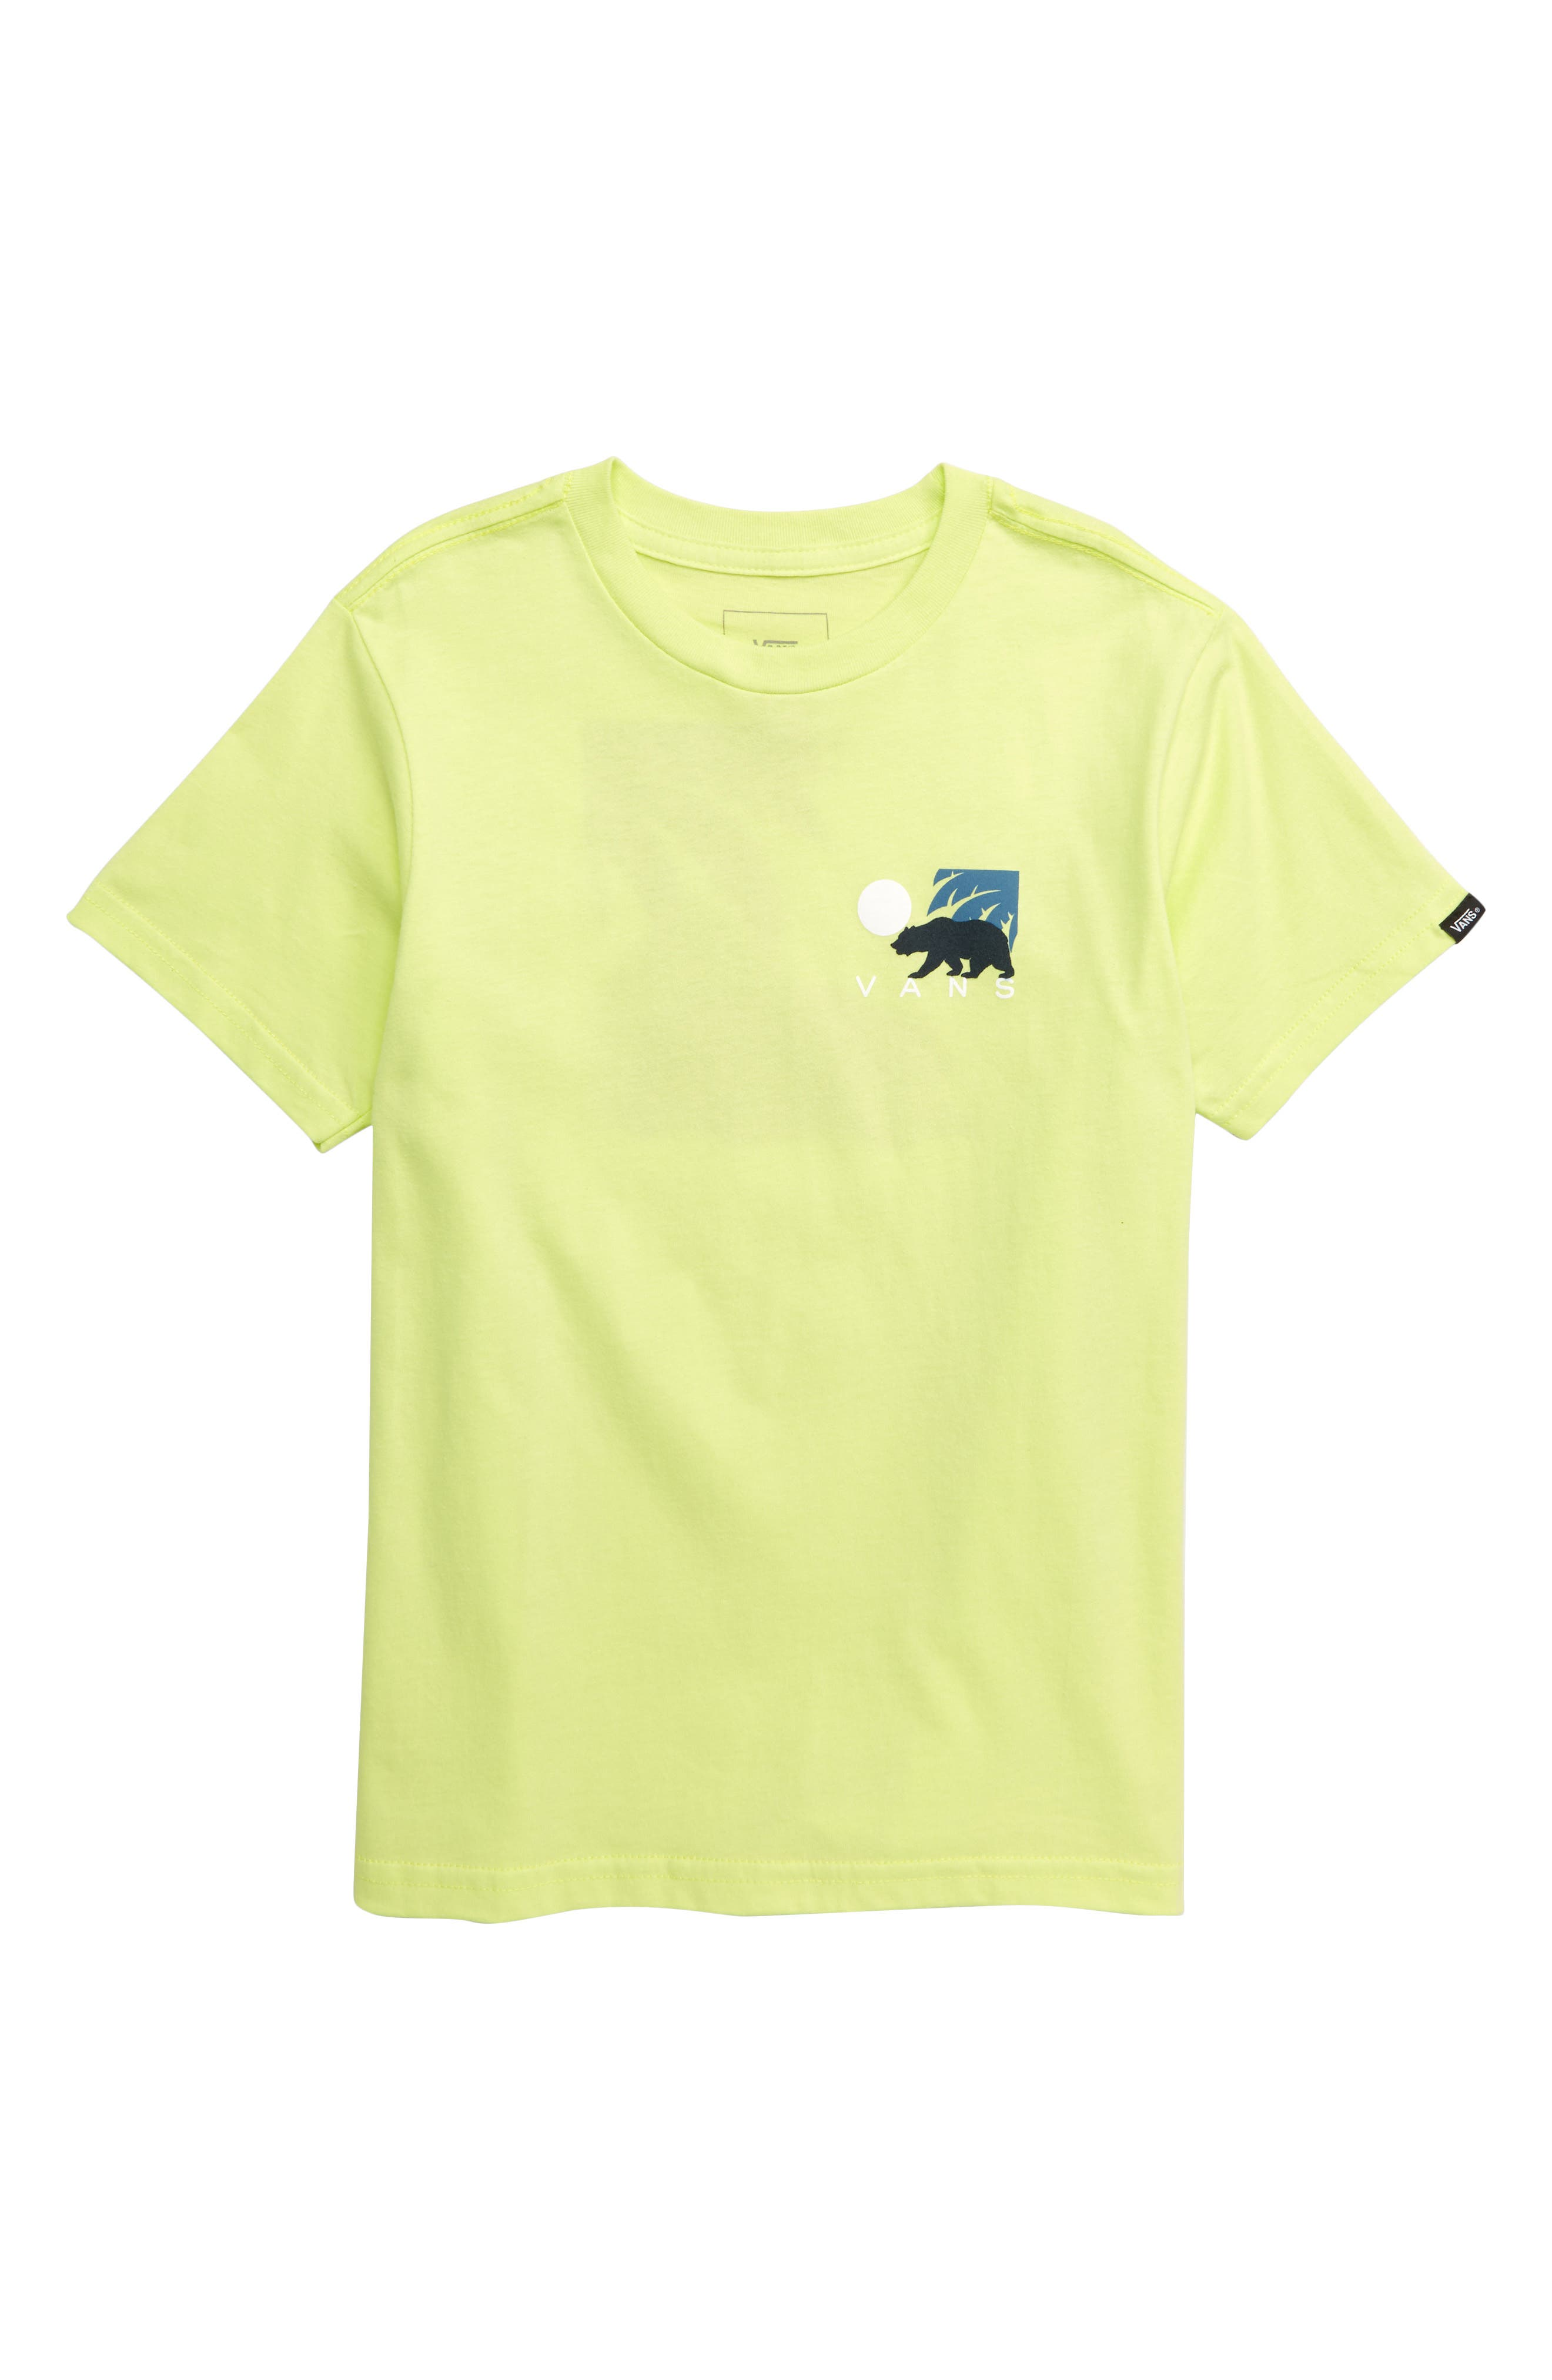 VANS Cali Winter Graphic T-Shirt, Main, color, SUNNY LIME